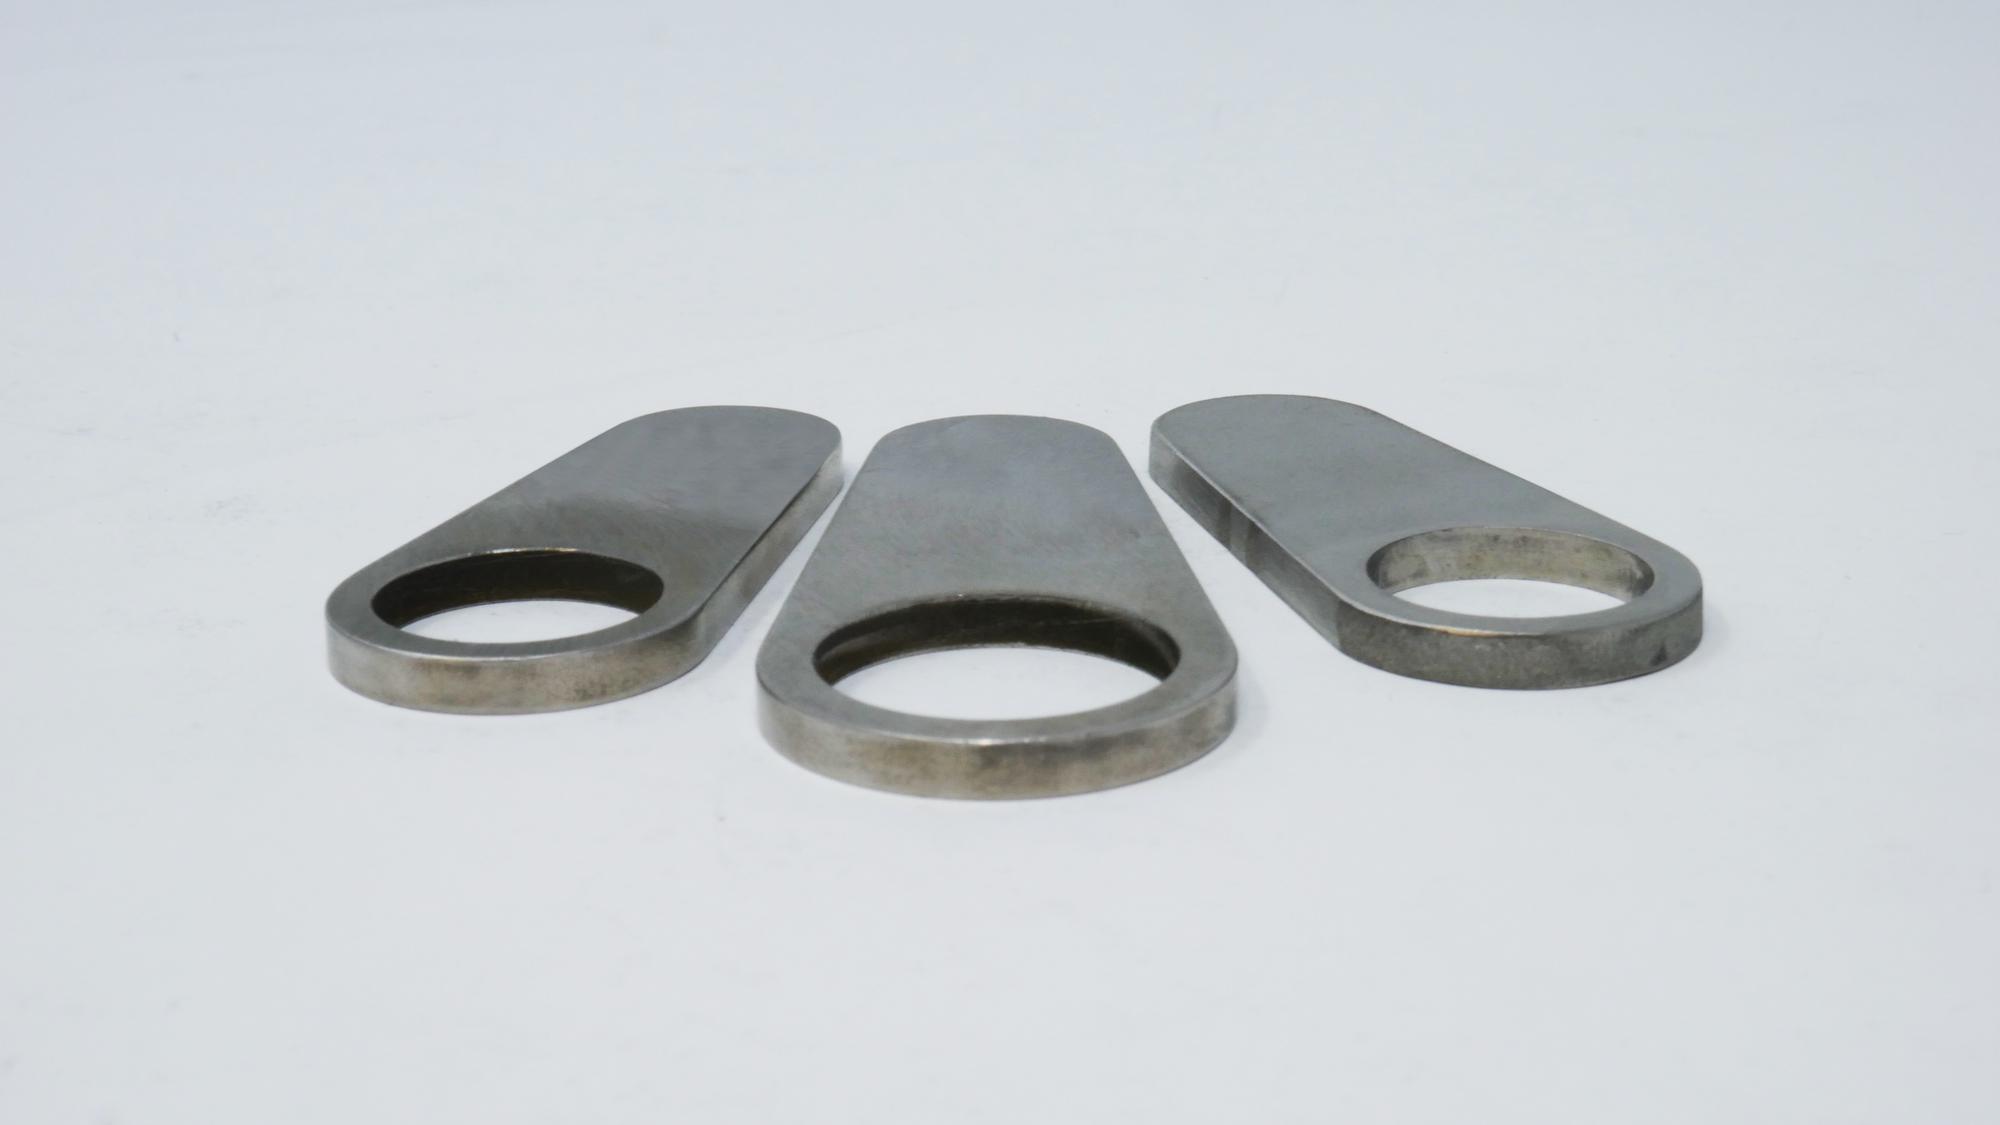 waterjet cutting for metal material